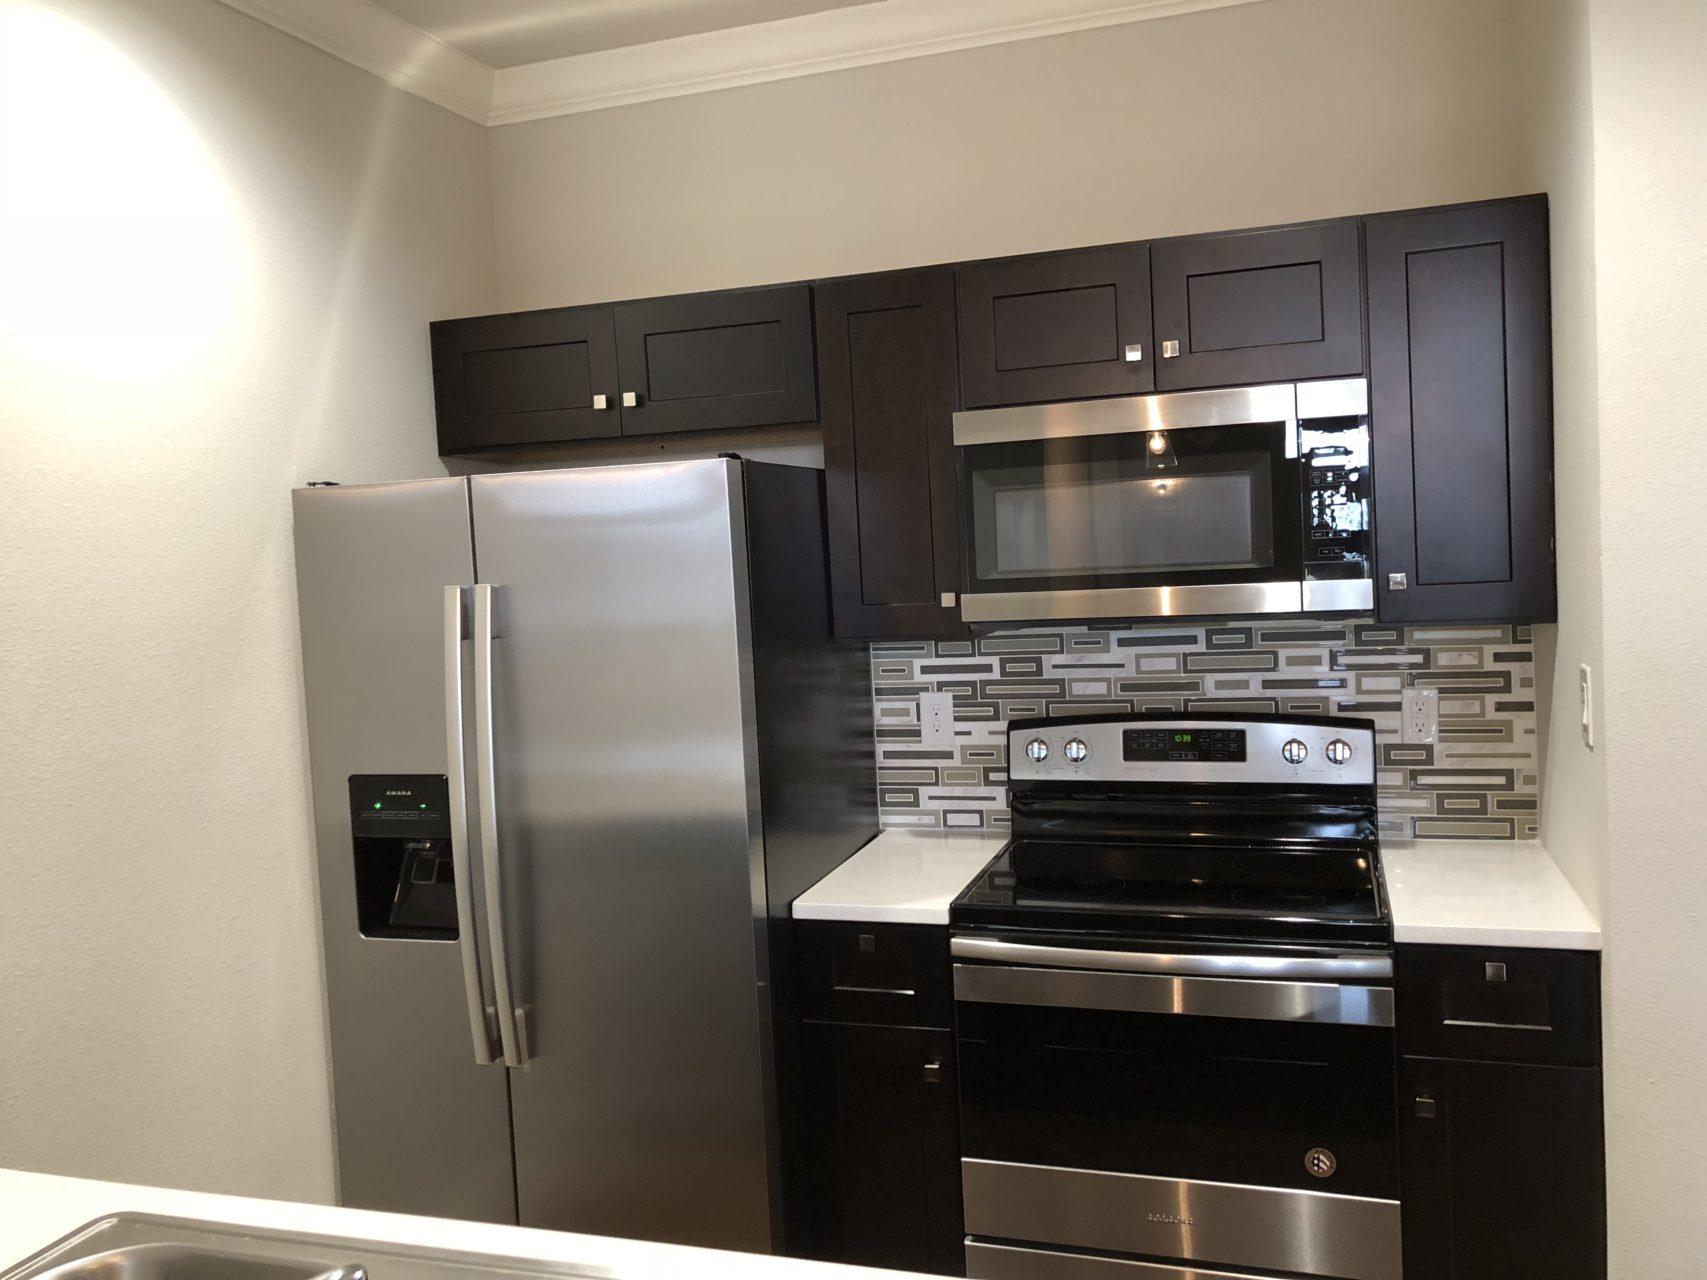 Parker Plaza Apartments - New Generation Kitchen & Bath